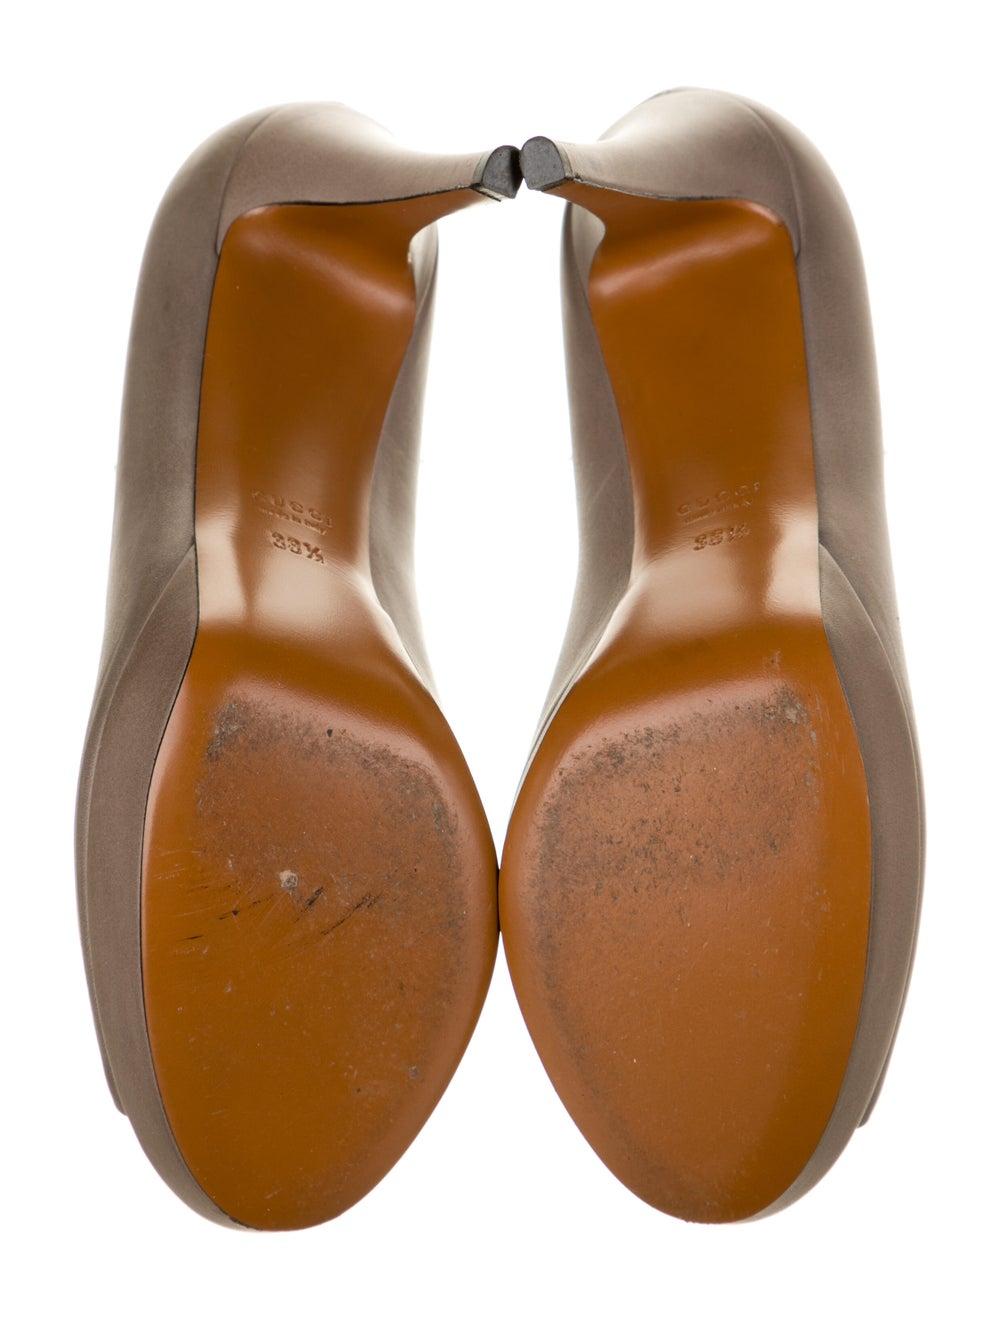 Gucci Leather Pumps - image 5